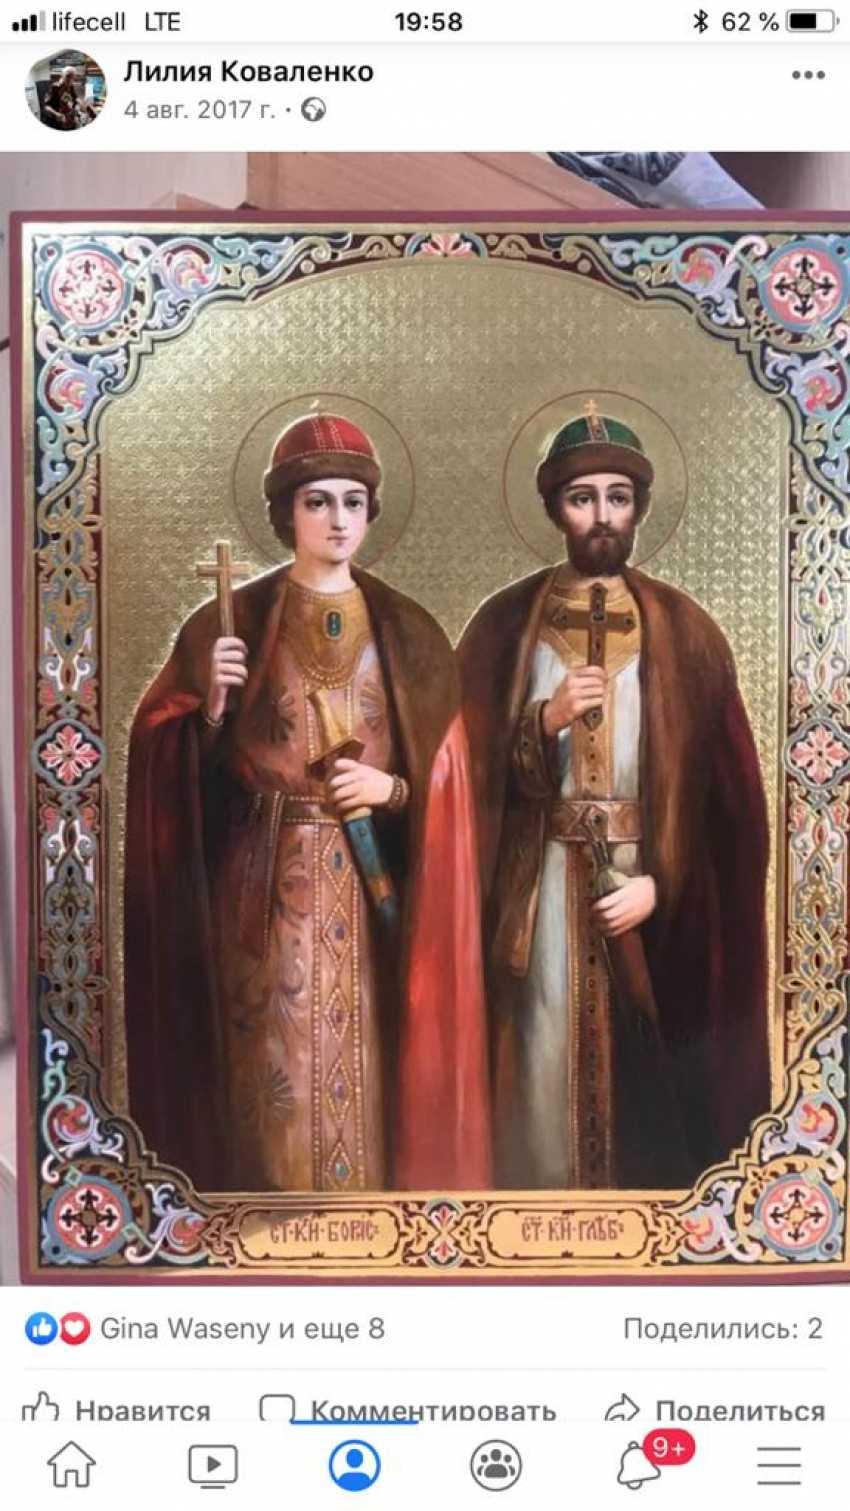 Lilia Kovalenko. Saints Boris and Gleb, the last supper, the Transfiguration, the Nativity - photo 1